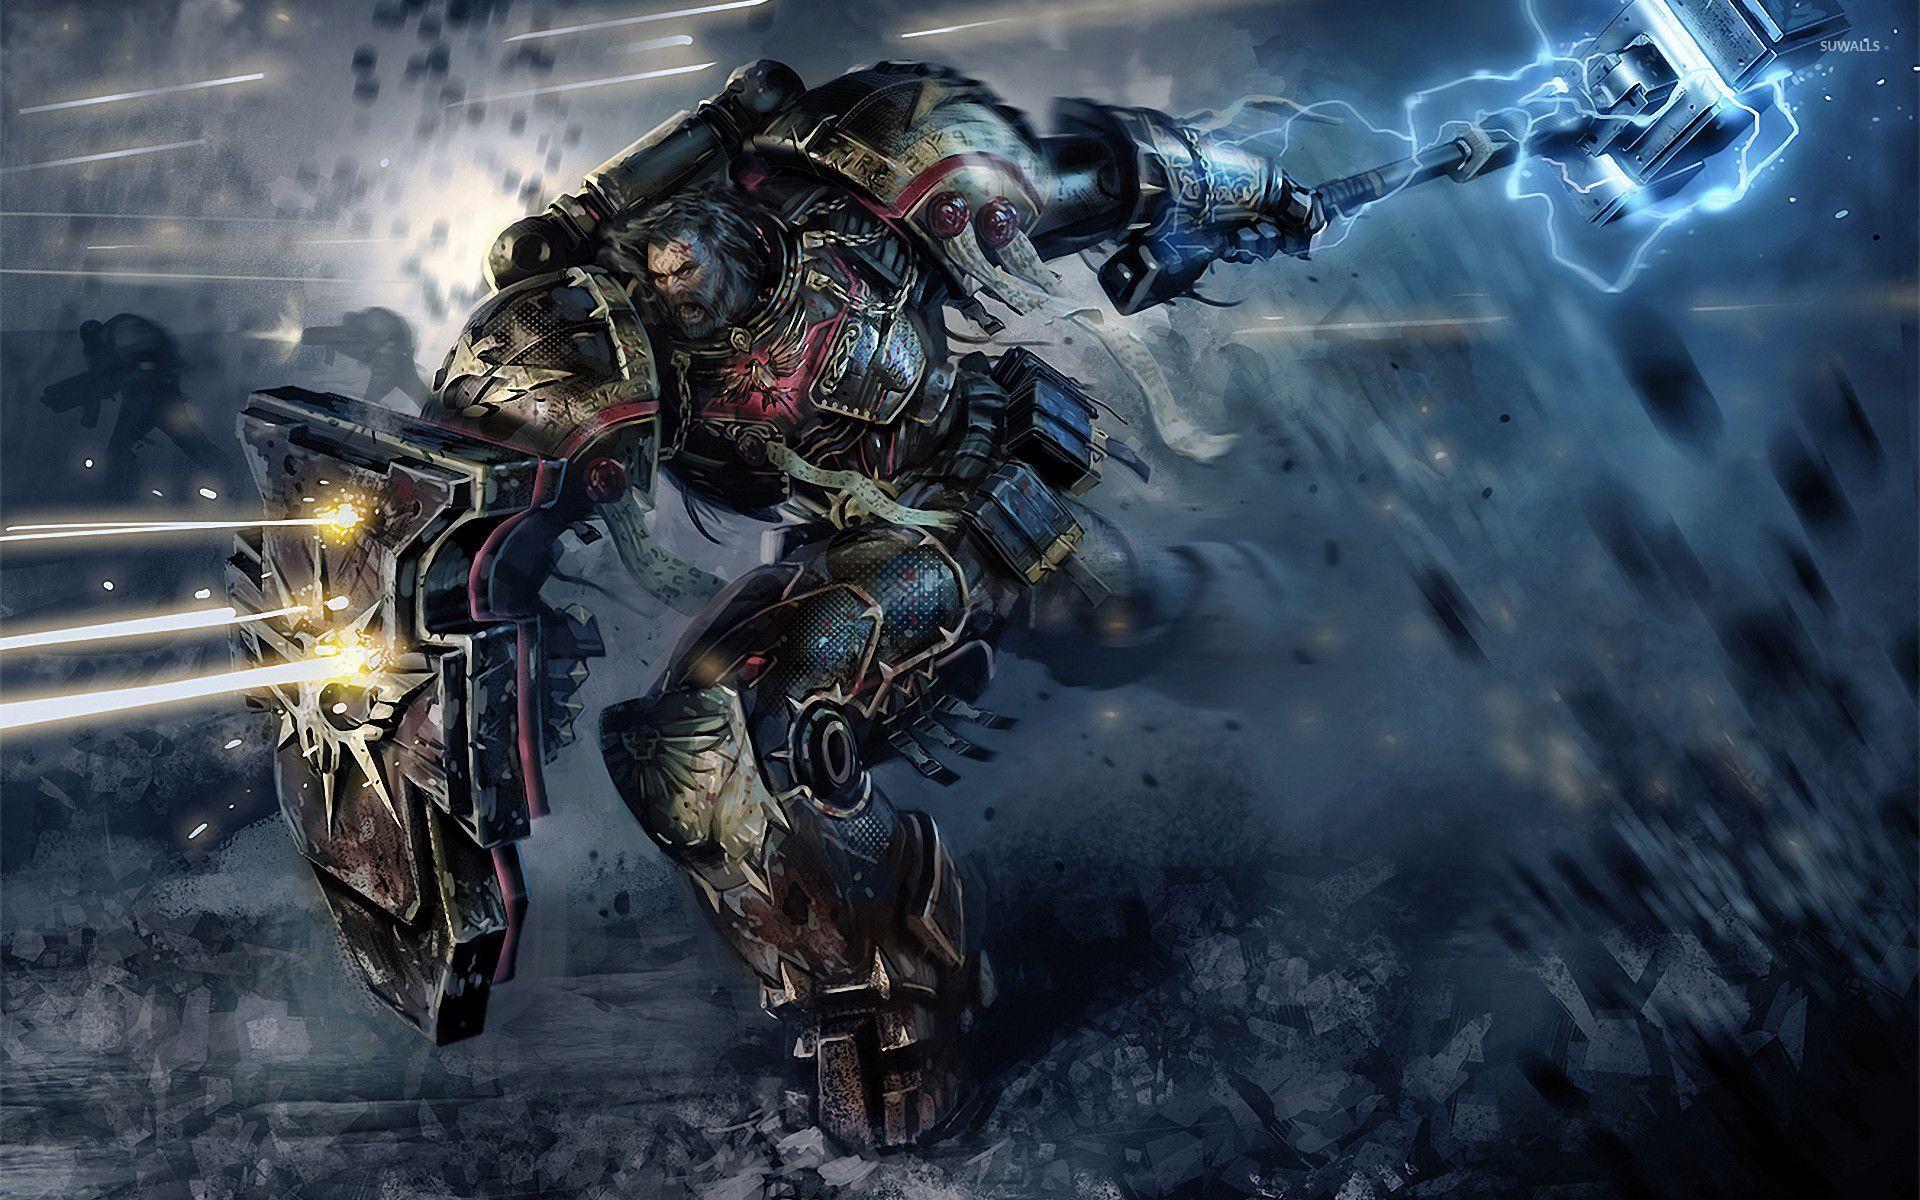 Warhammer 40000 2 Wallpaper Game Wallpapers 30555